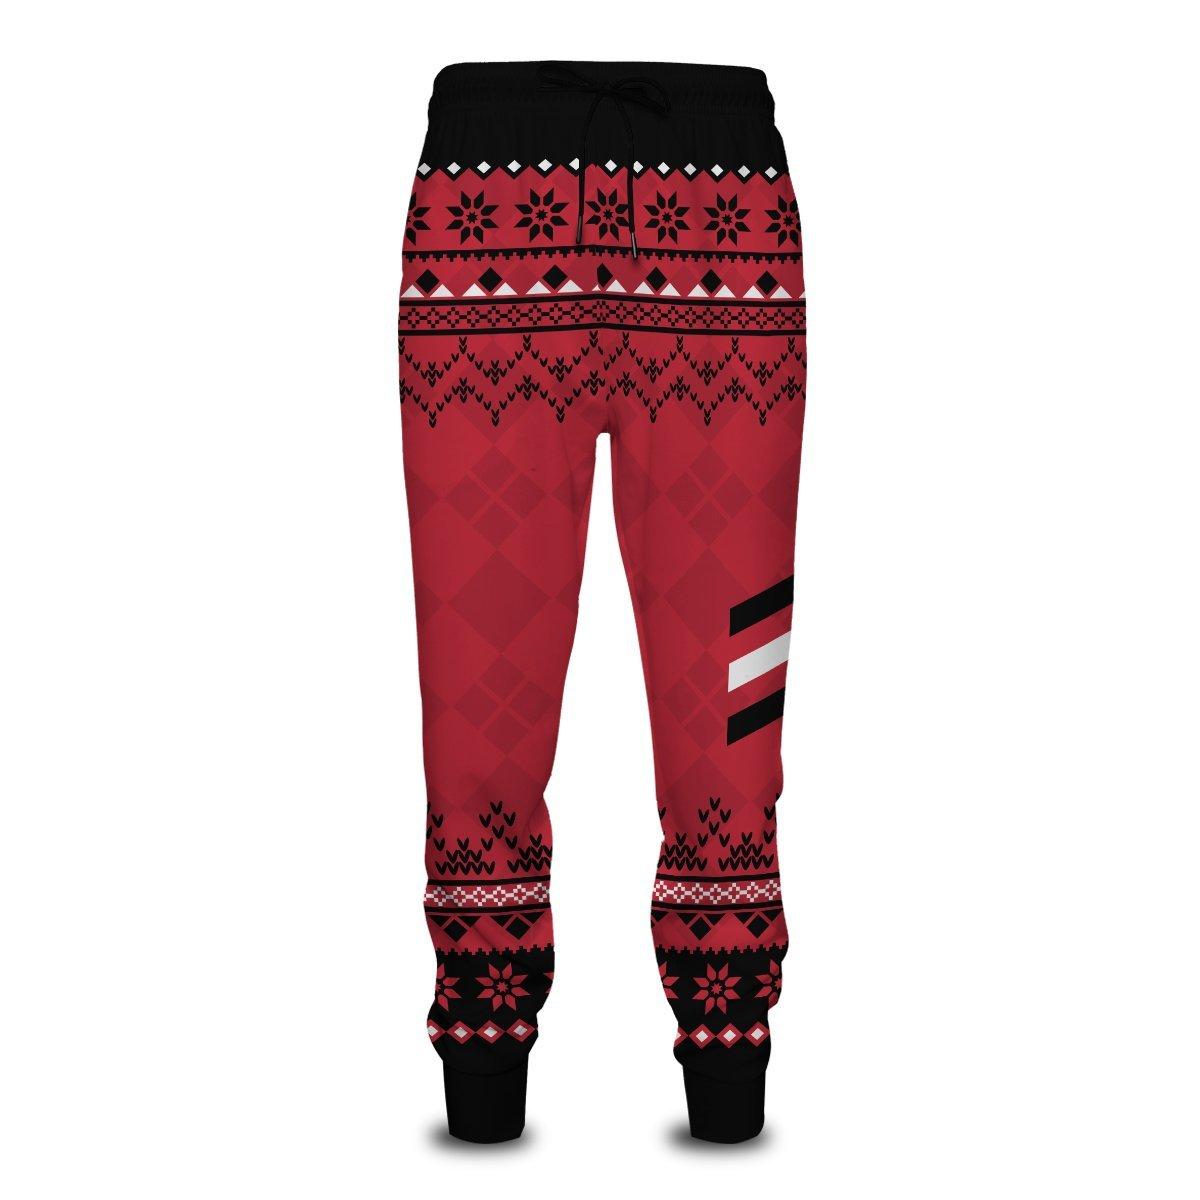 Haikyuu National Team Christmas Jogger Pants FDM0310 S Official Otaku Treat Merch